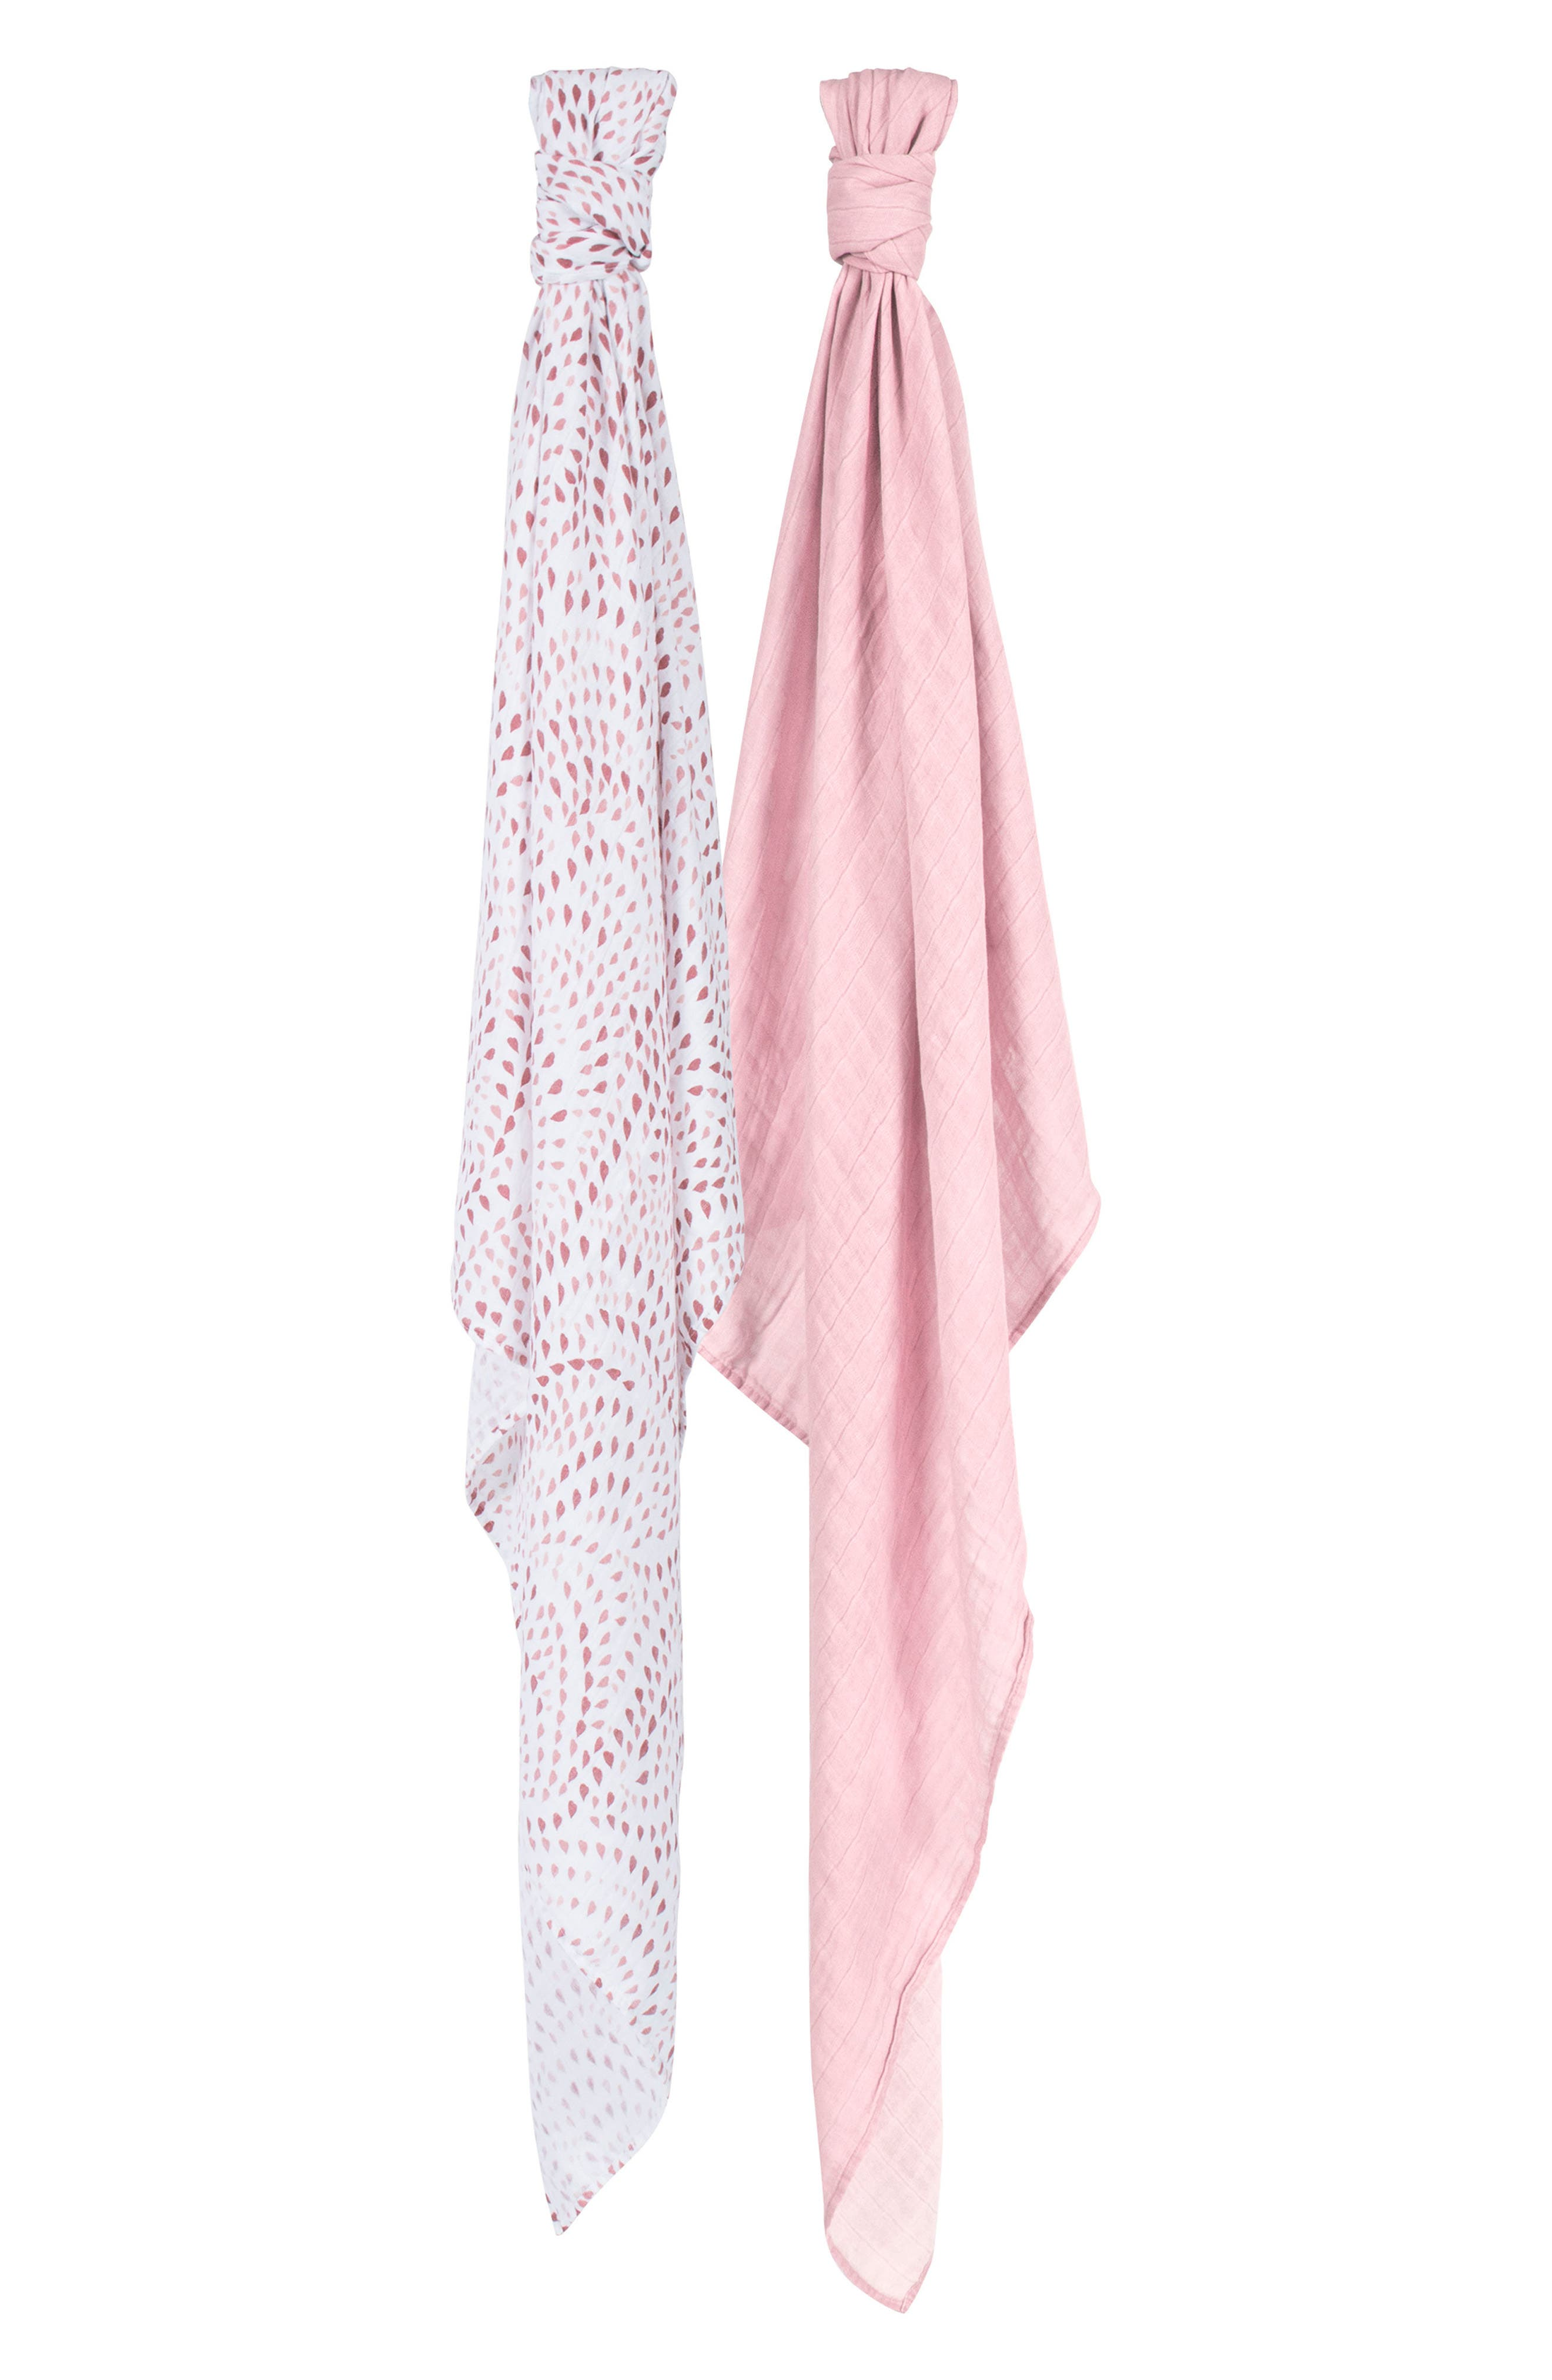 2-Pack Muslin Swaddle Blankets,                         Main,                         color, Rose Quartz And Petal